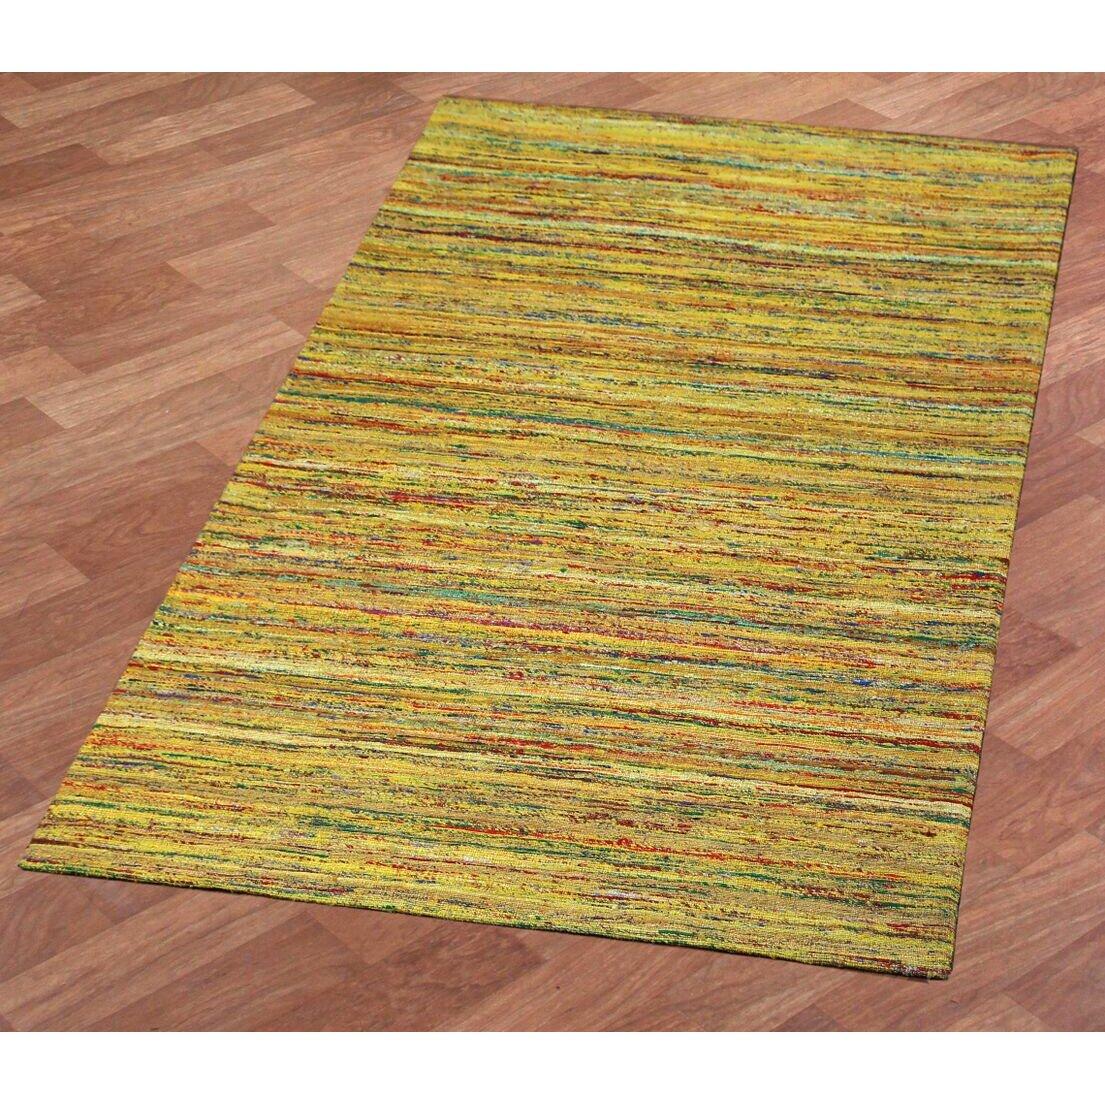 St croix sari silk handmade yellow area rug wayfair for Custom made area rugs